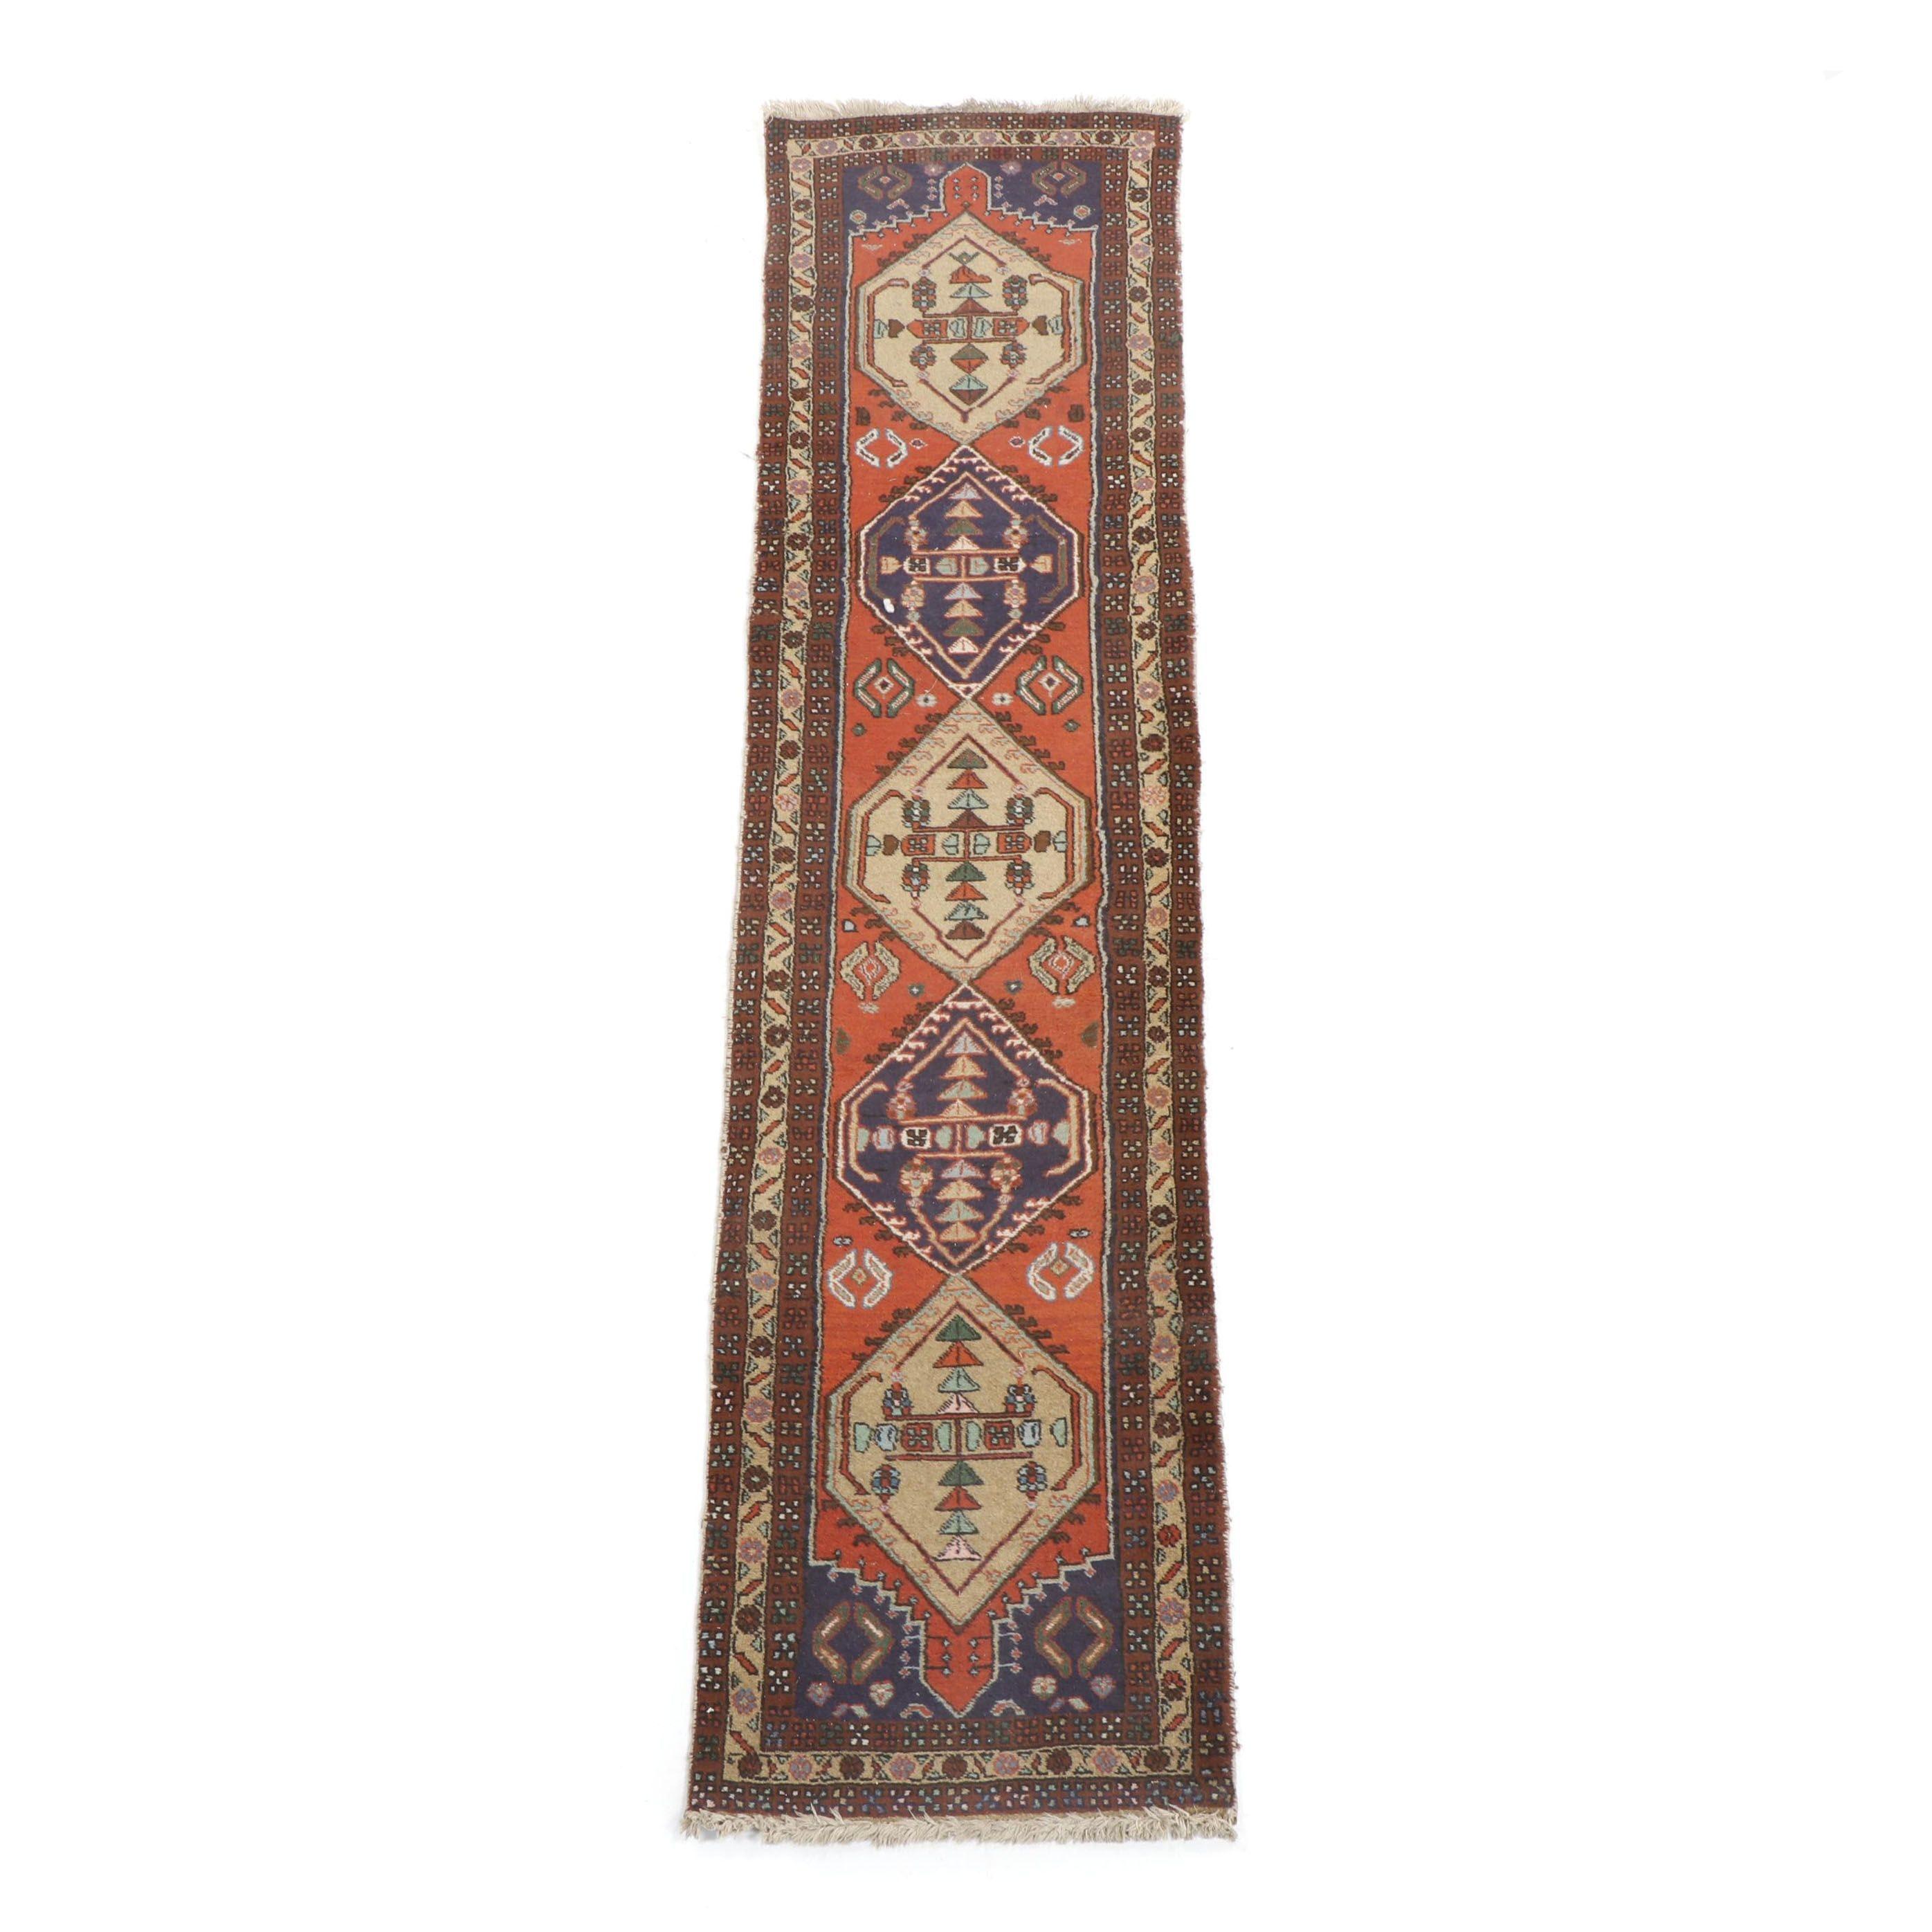 Hand-Knotted Anatolian Ortakoy Wool Carpet Runner